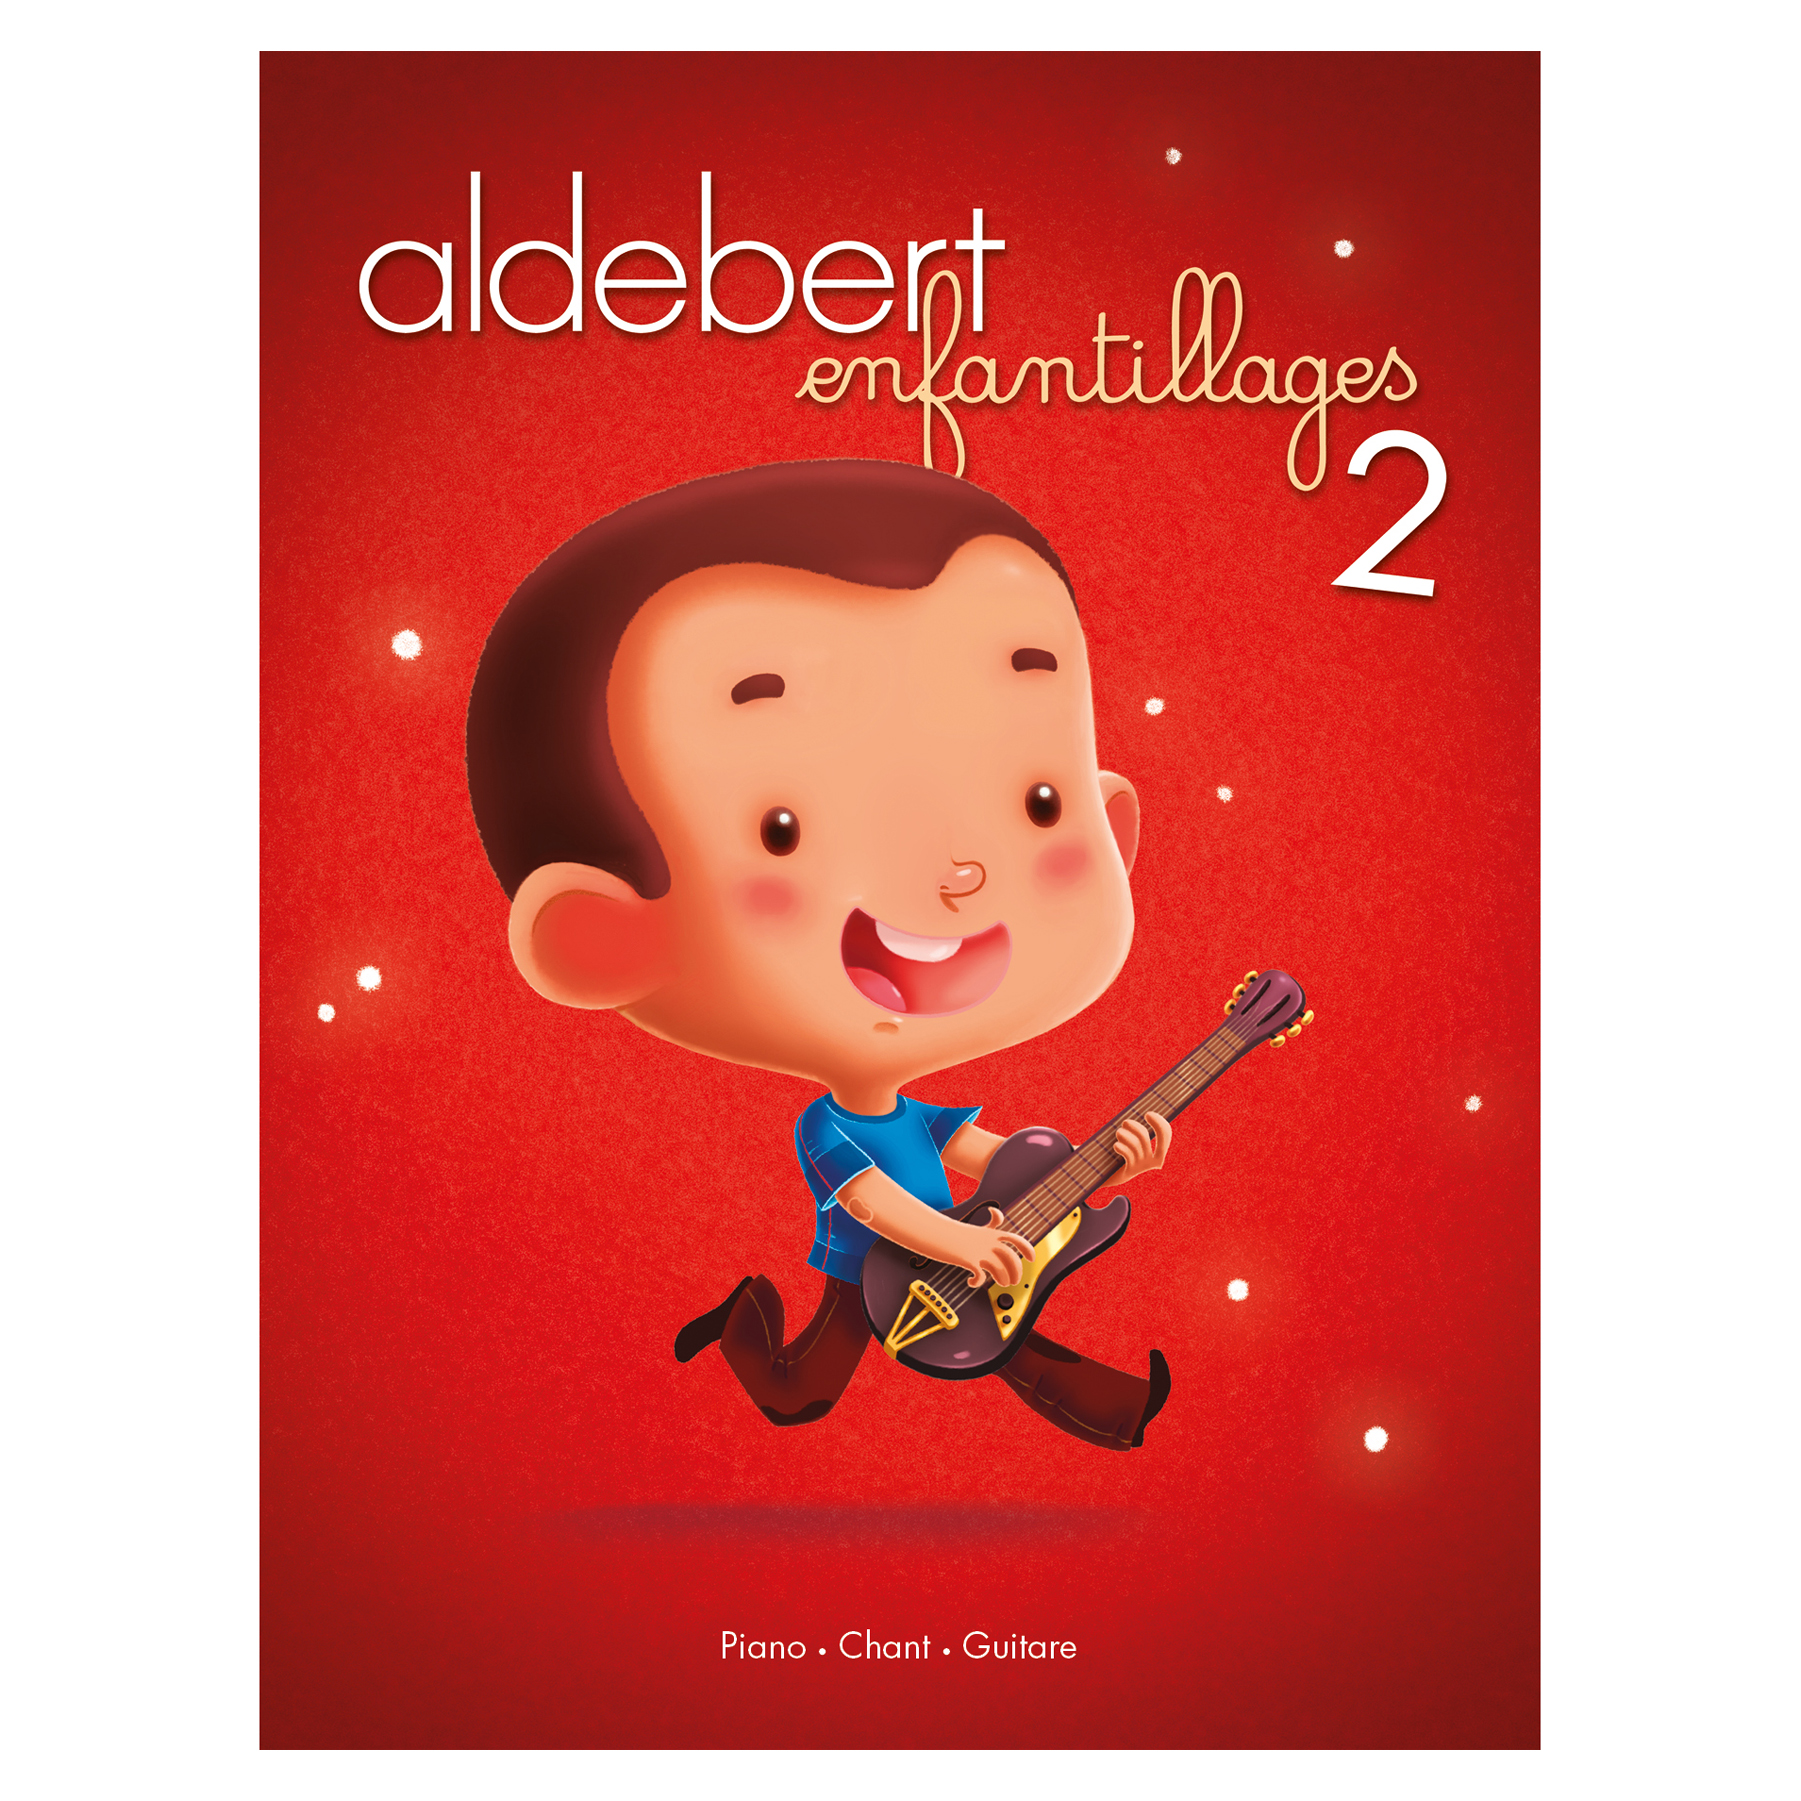 Partitions - Enfantillage 2 Aldebert